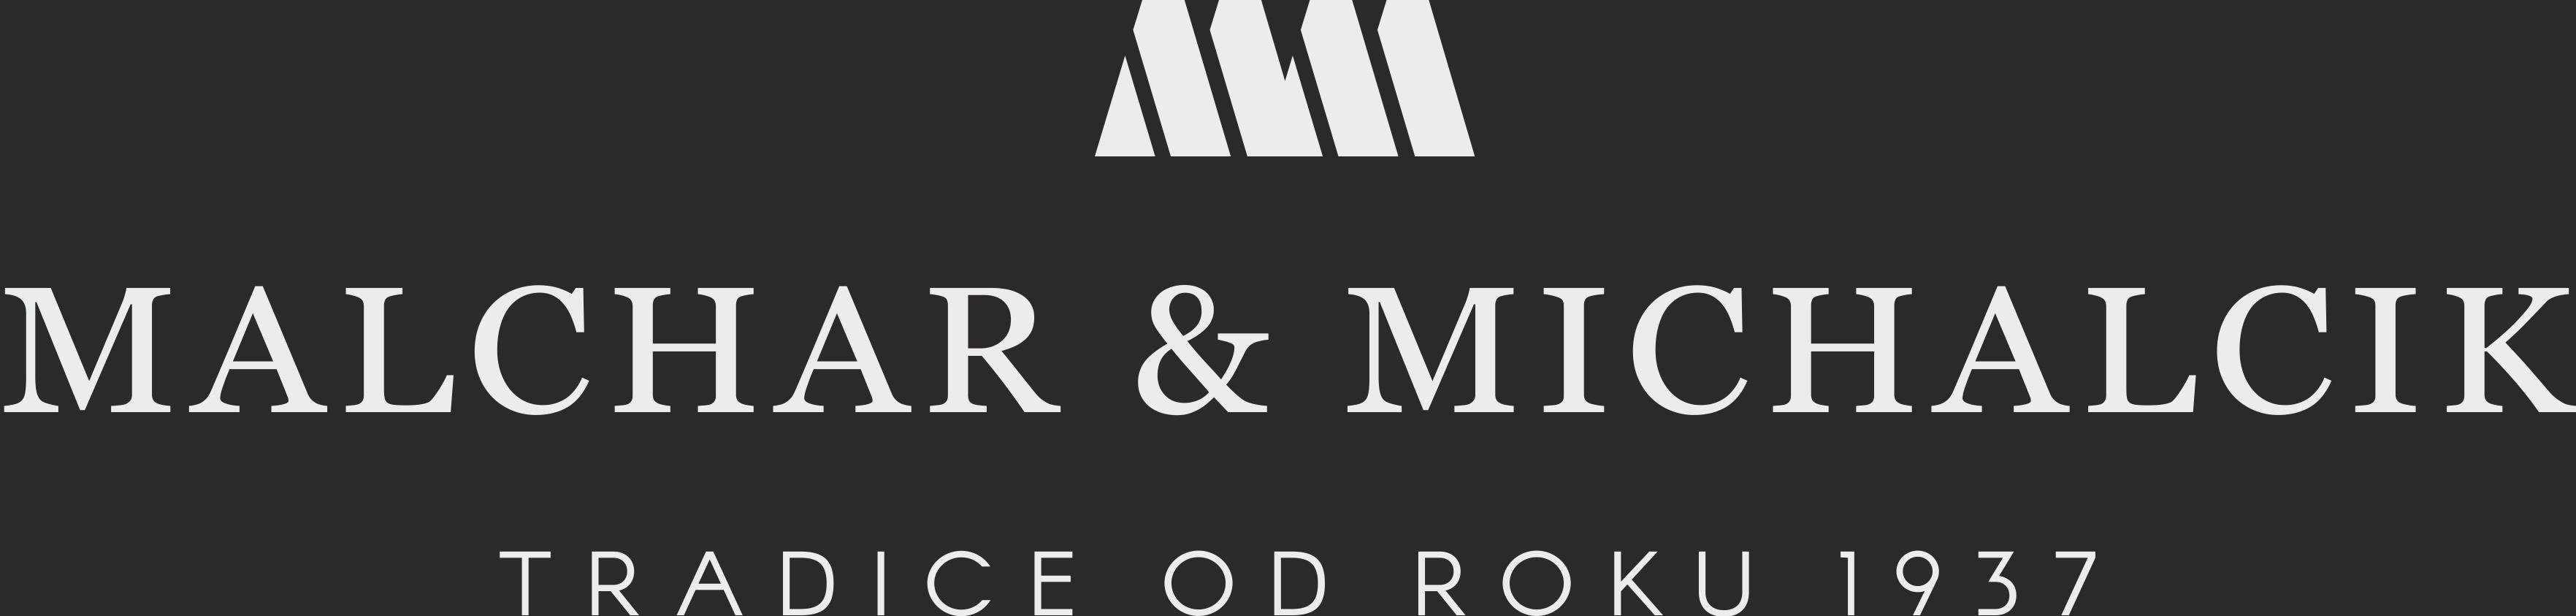 MALCHAR & MICHALČÍK s.r.o.